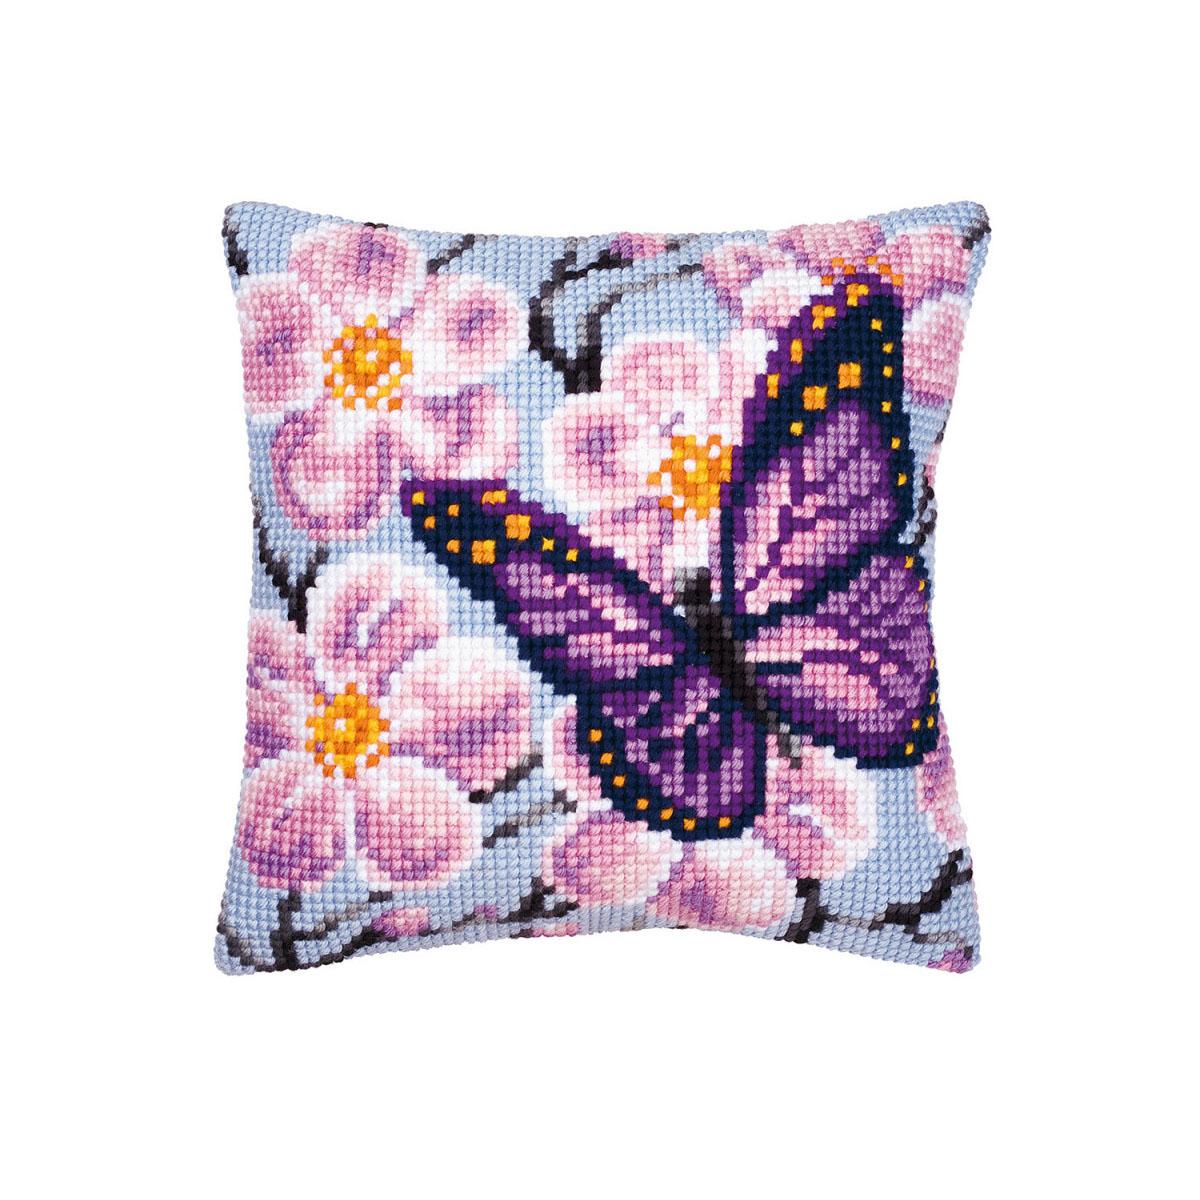 0008501-PN Подушка Vervaco 'Фиолетовая бабочка' 40x40см